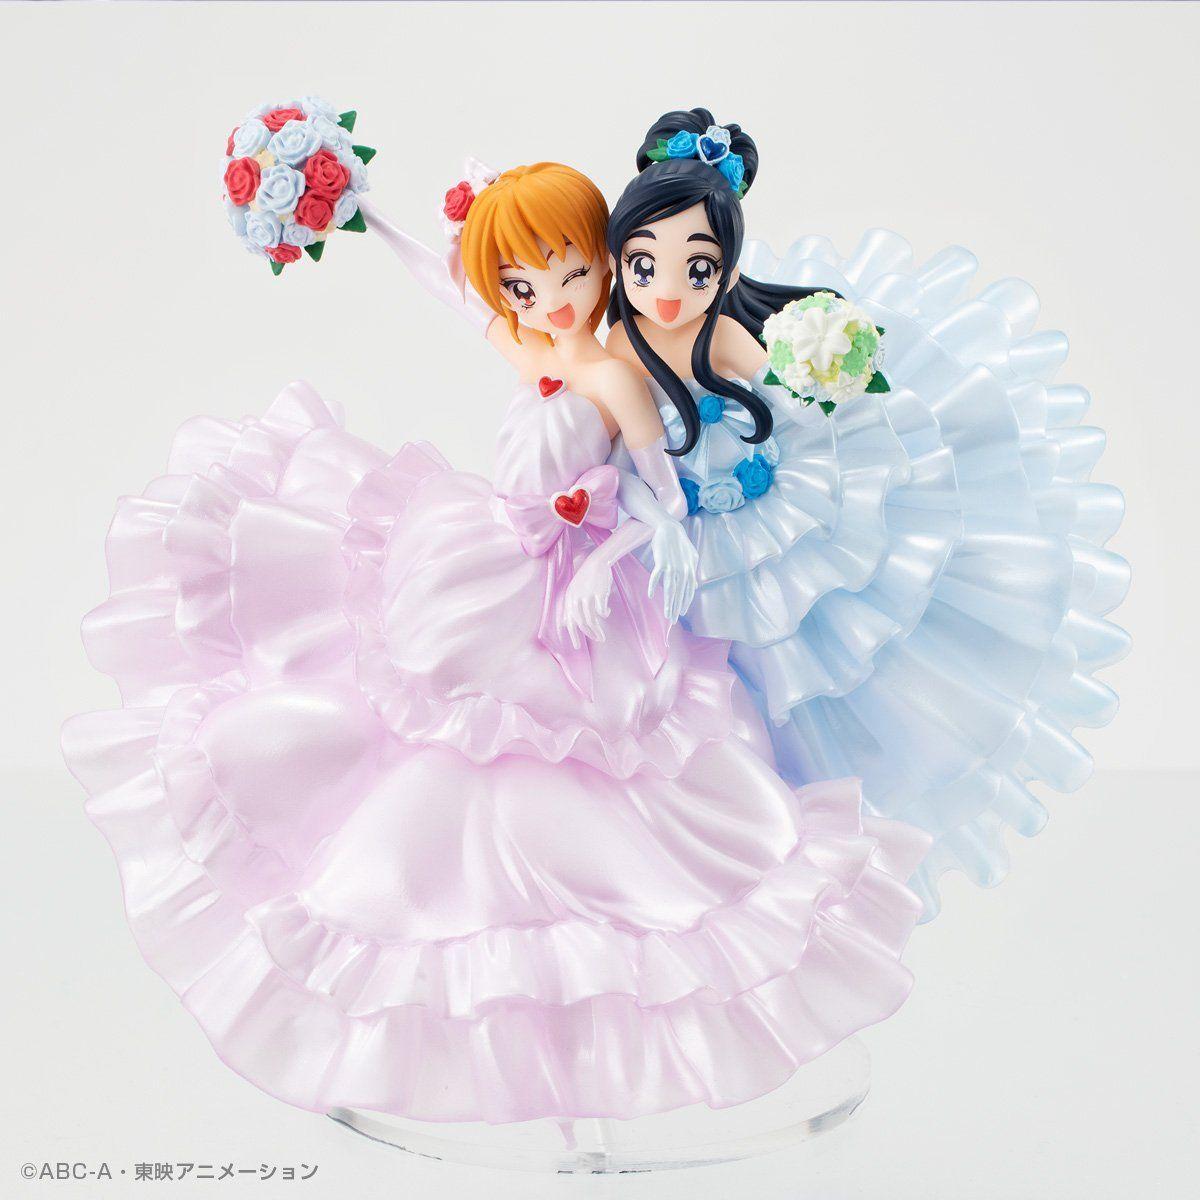 HG GIRLS『ふたりはプリキュアメモリアルフィギュア』完成品フィギュア-006